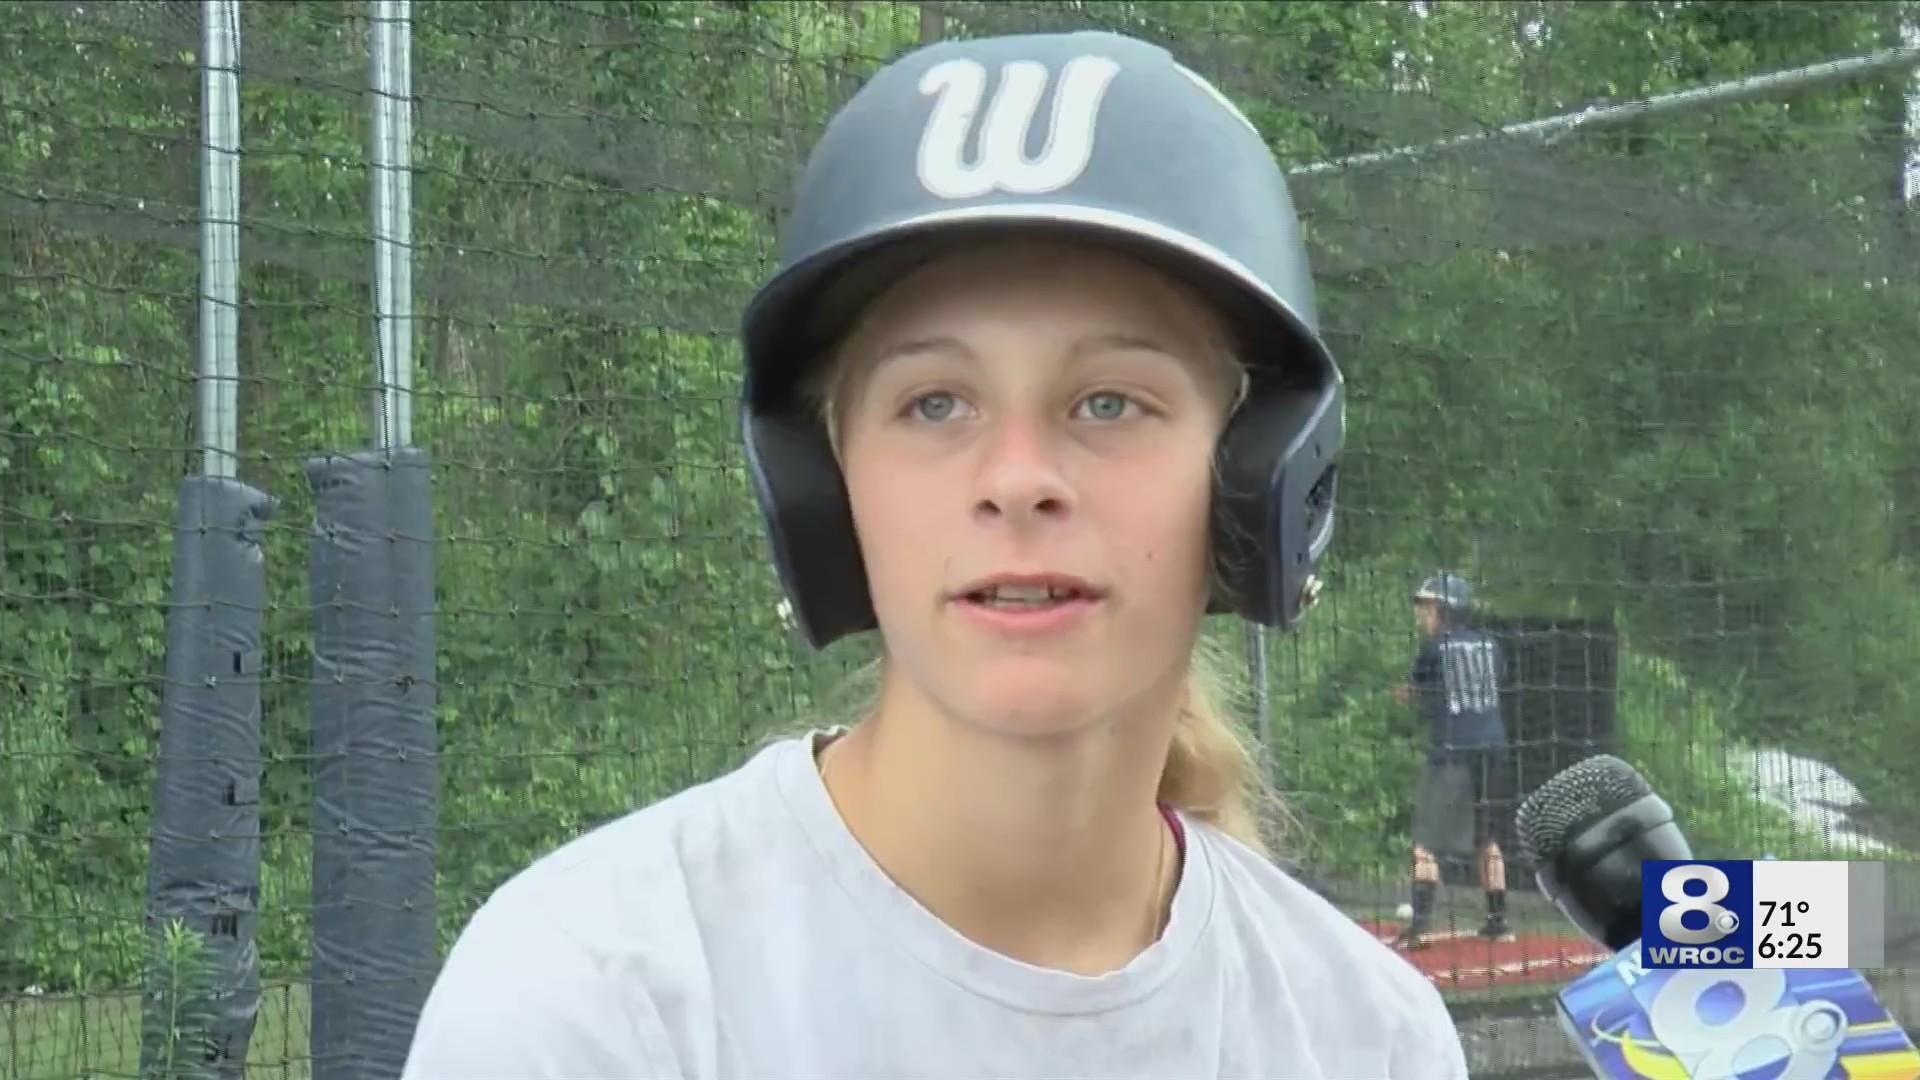 Webster girl stars on Rochester's top little league team